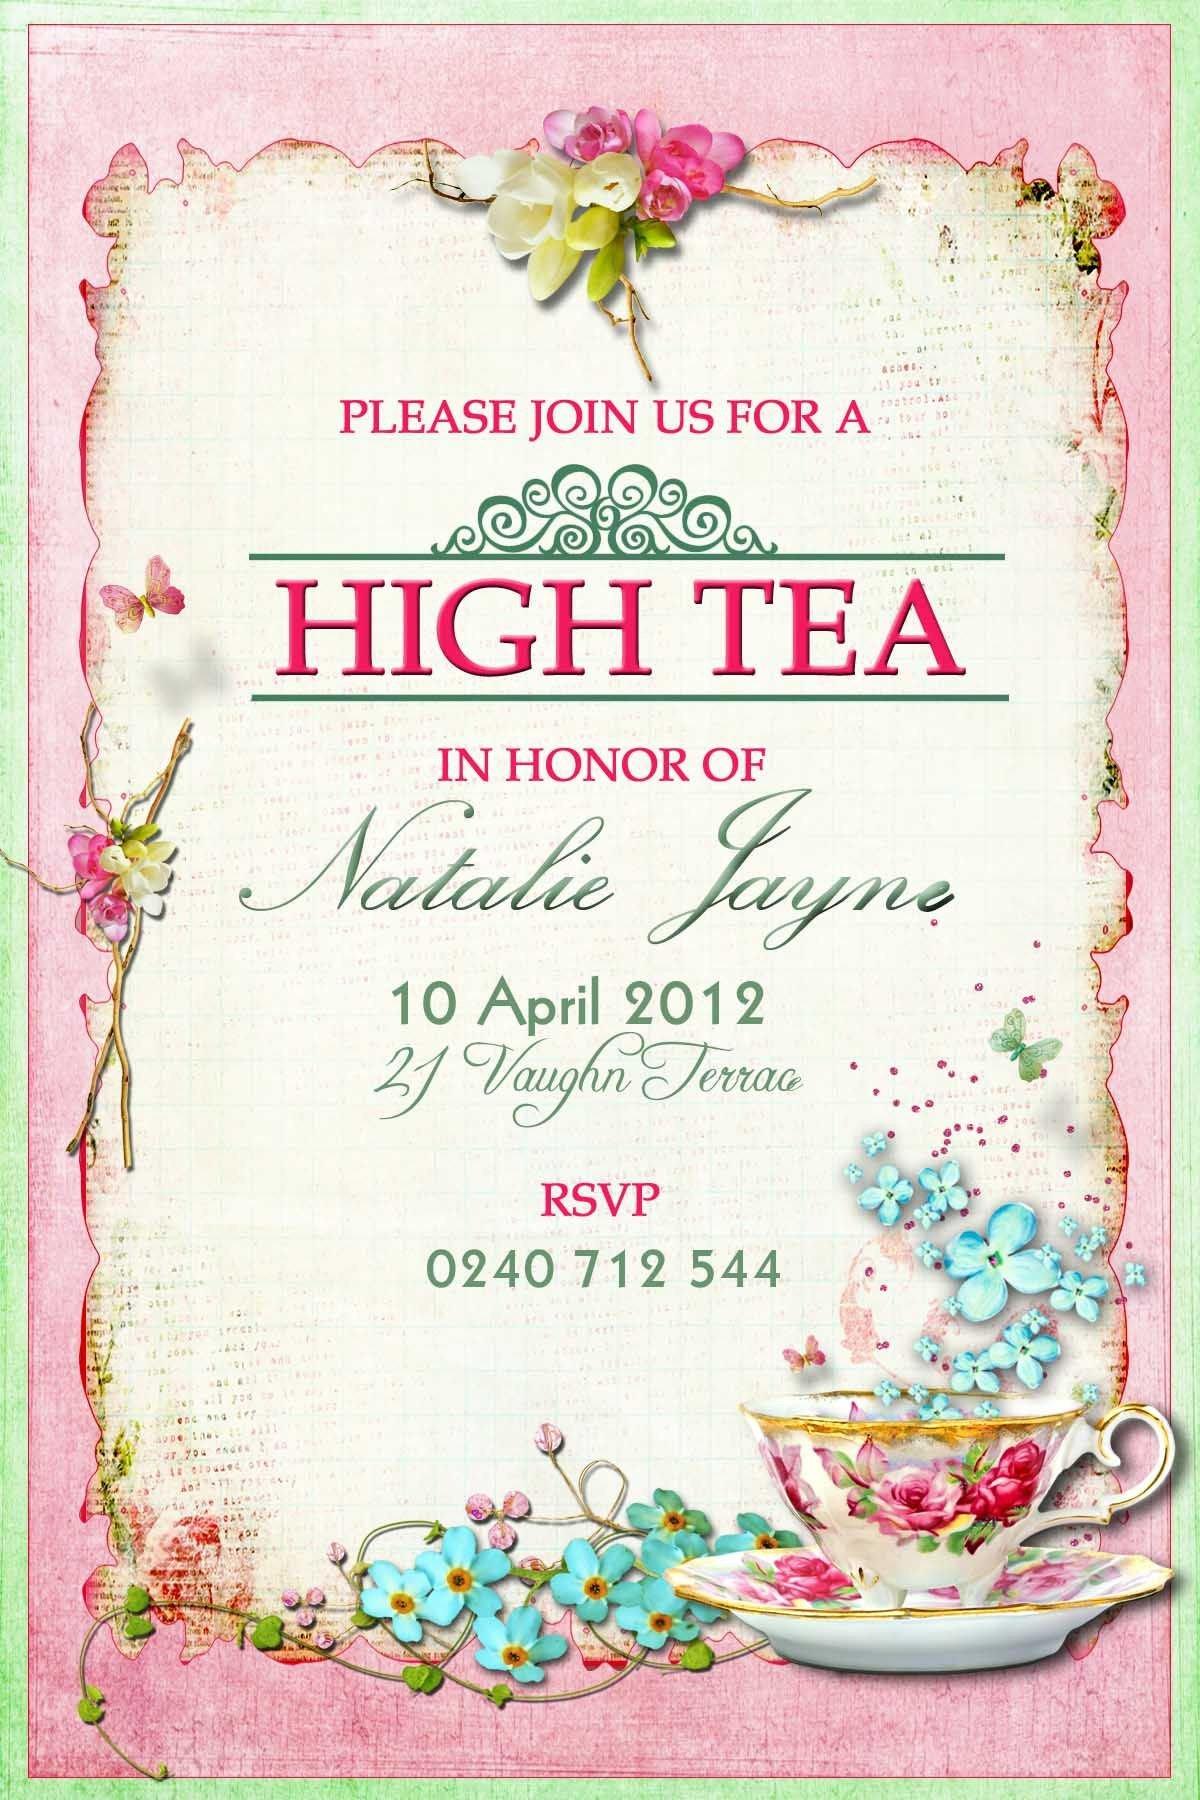 Tea Party Invitations Templates Victorian High Tea Party Invitations Surprise Party